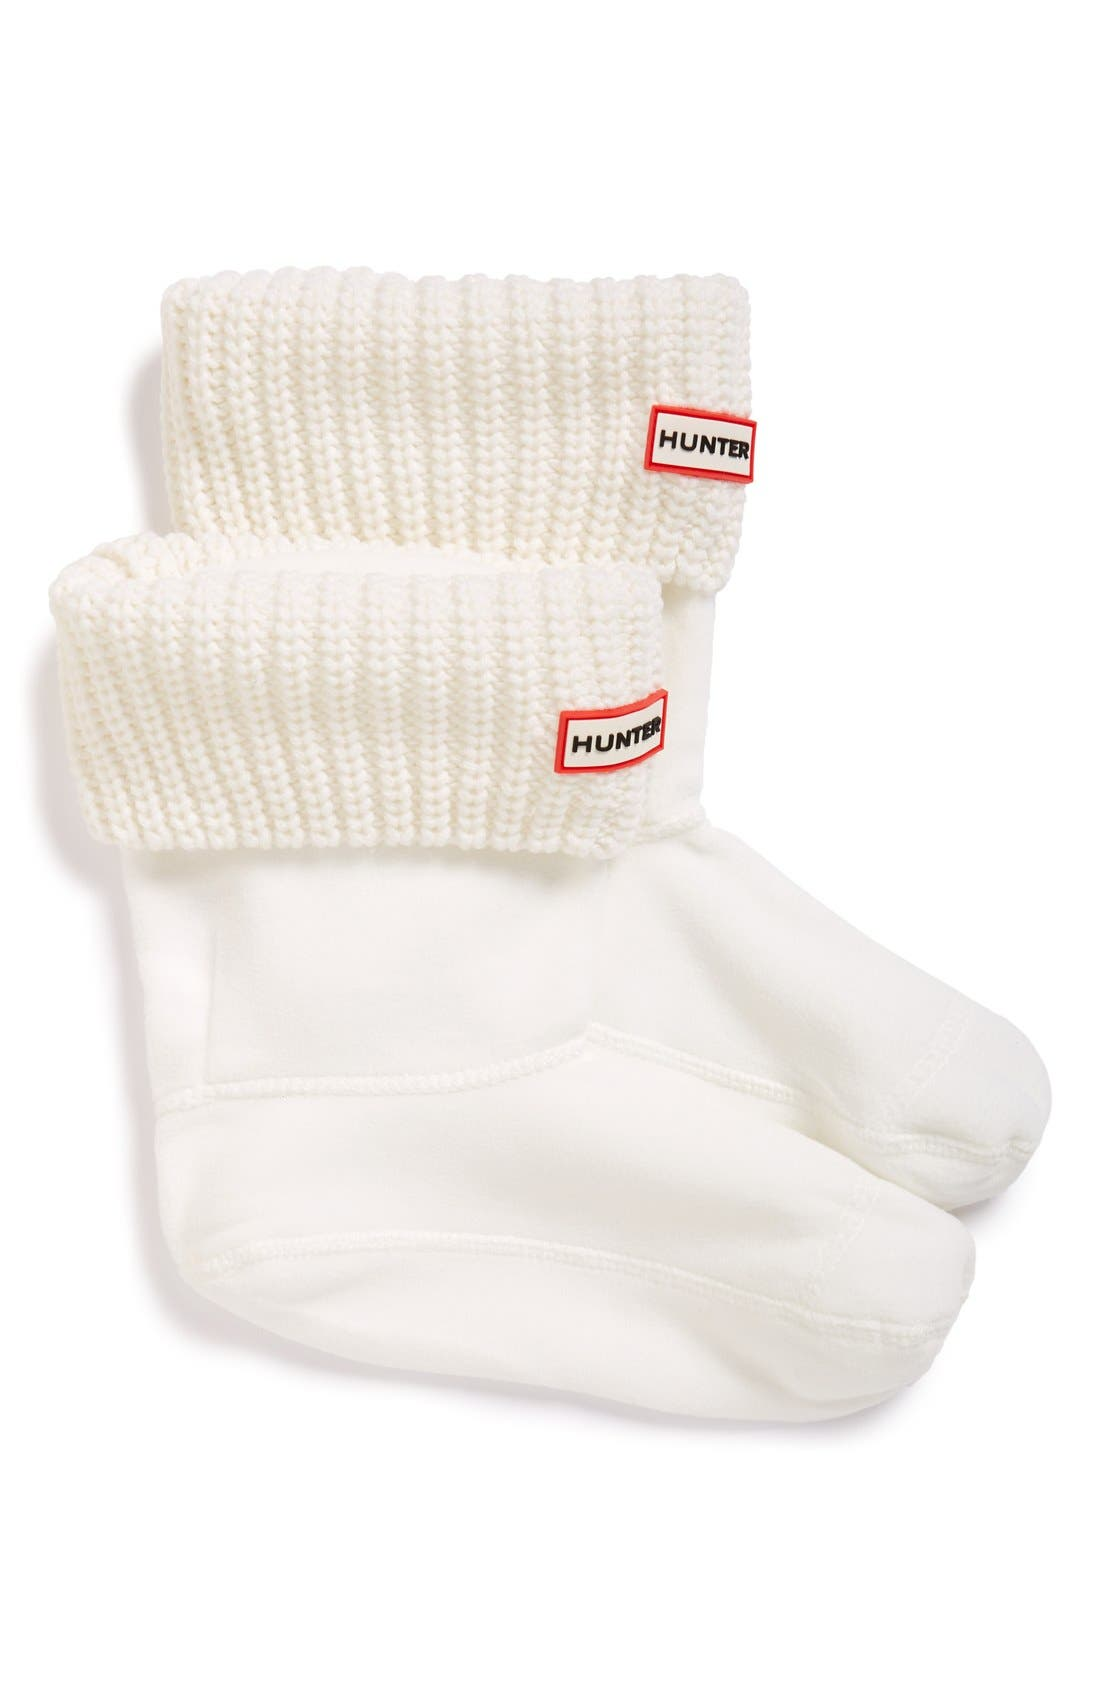 'Half Cardigan' Fleece Boot Socks,                             Main thumbnail 1, color,                             White